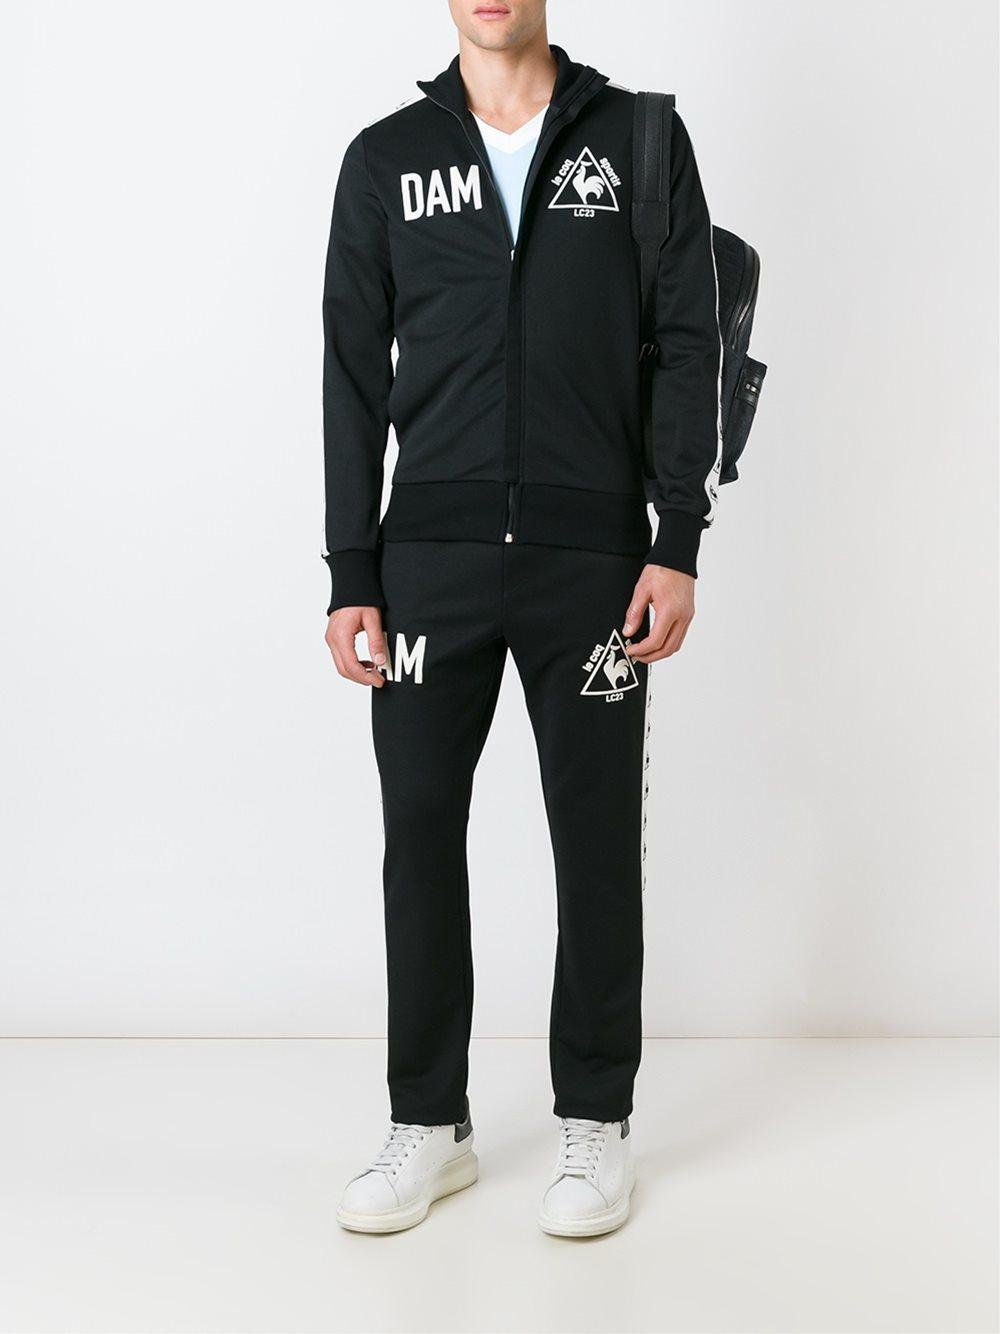 Le Coq Sportif Cotton 'dam' Trackpants in Black for Men